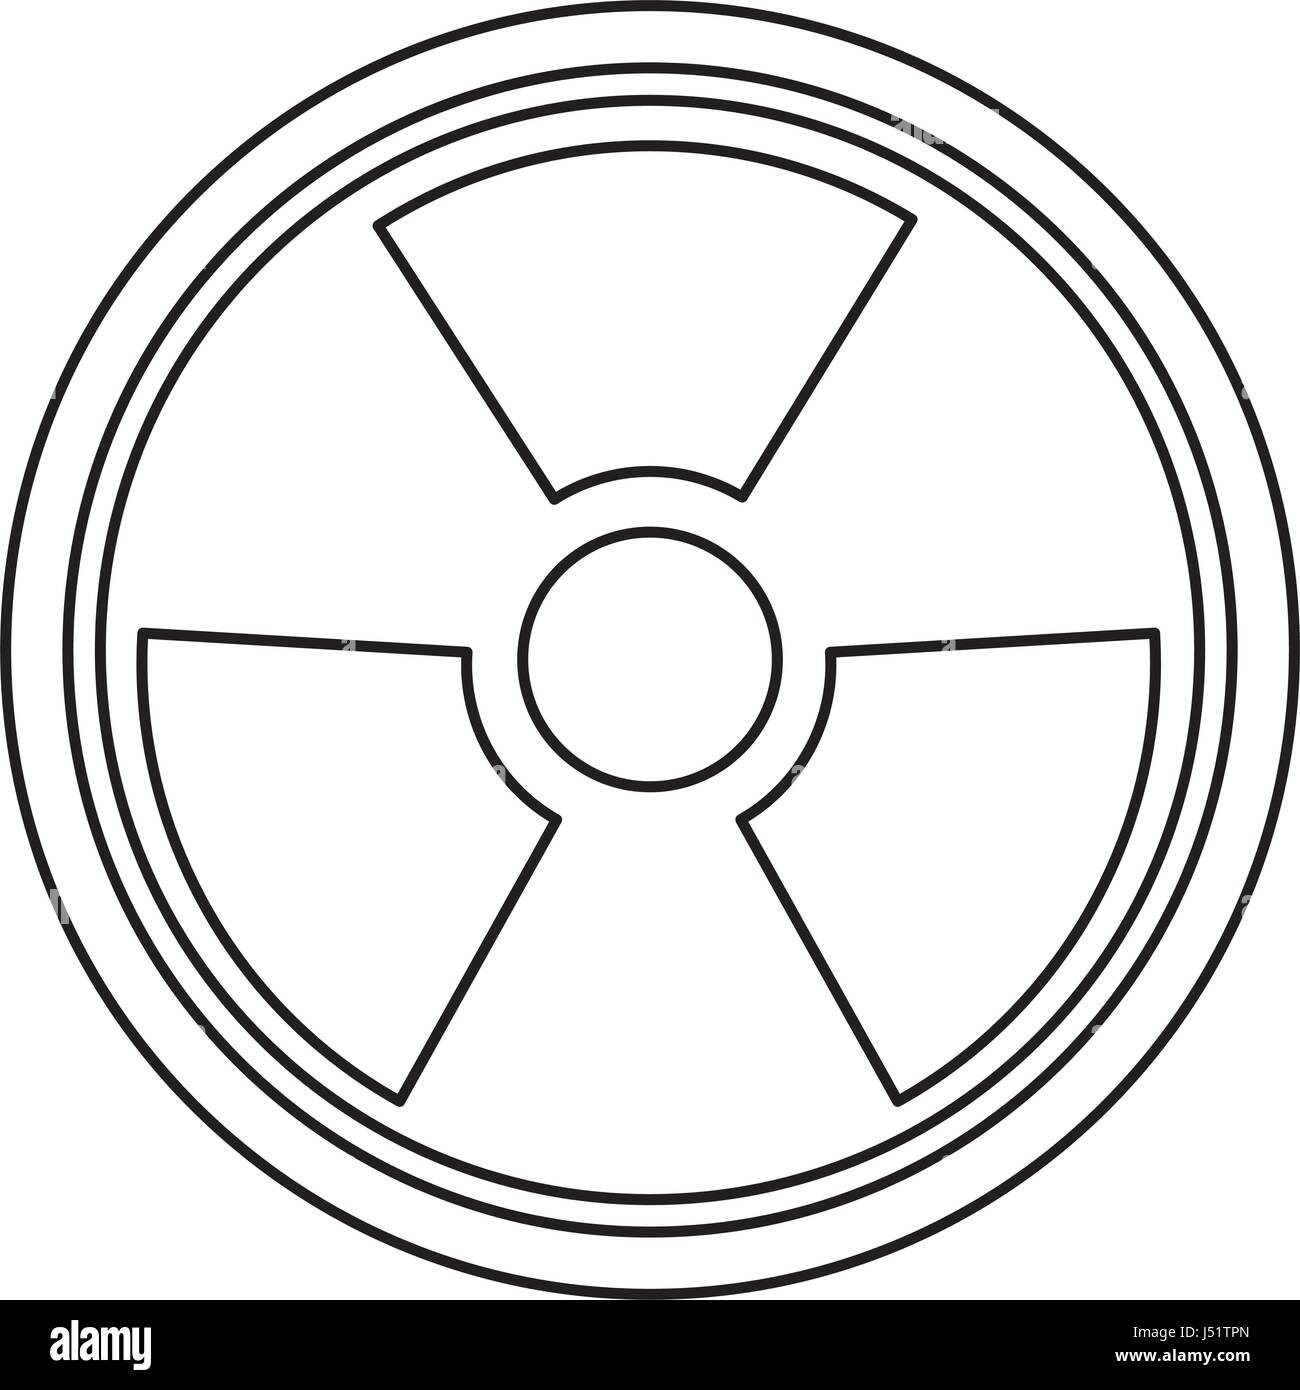 radiation caution hazard nuclear symbol - Stock Vector